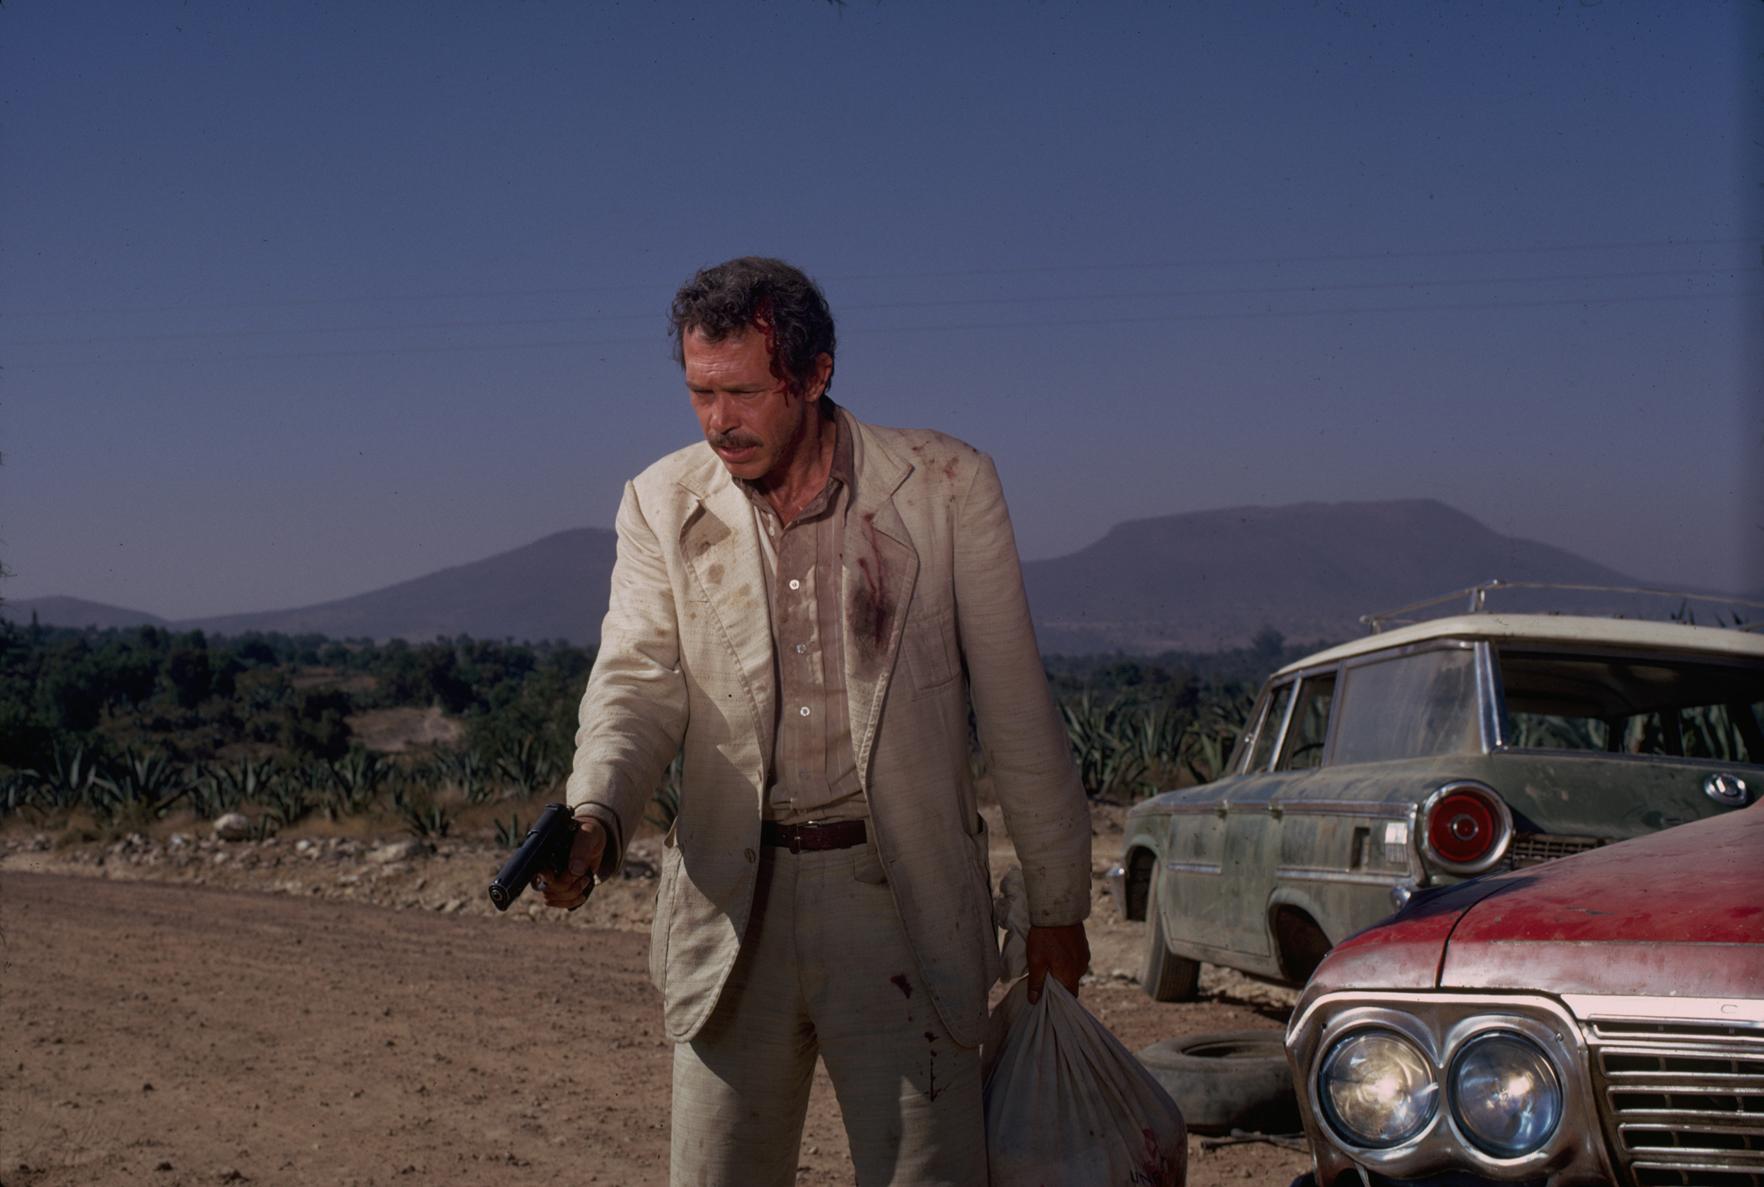 Movie Review: Bring Me The Head of Sam Peckinpah